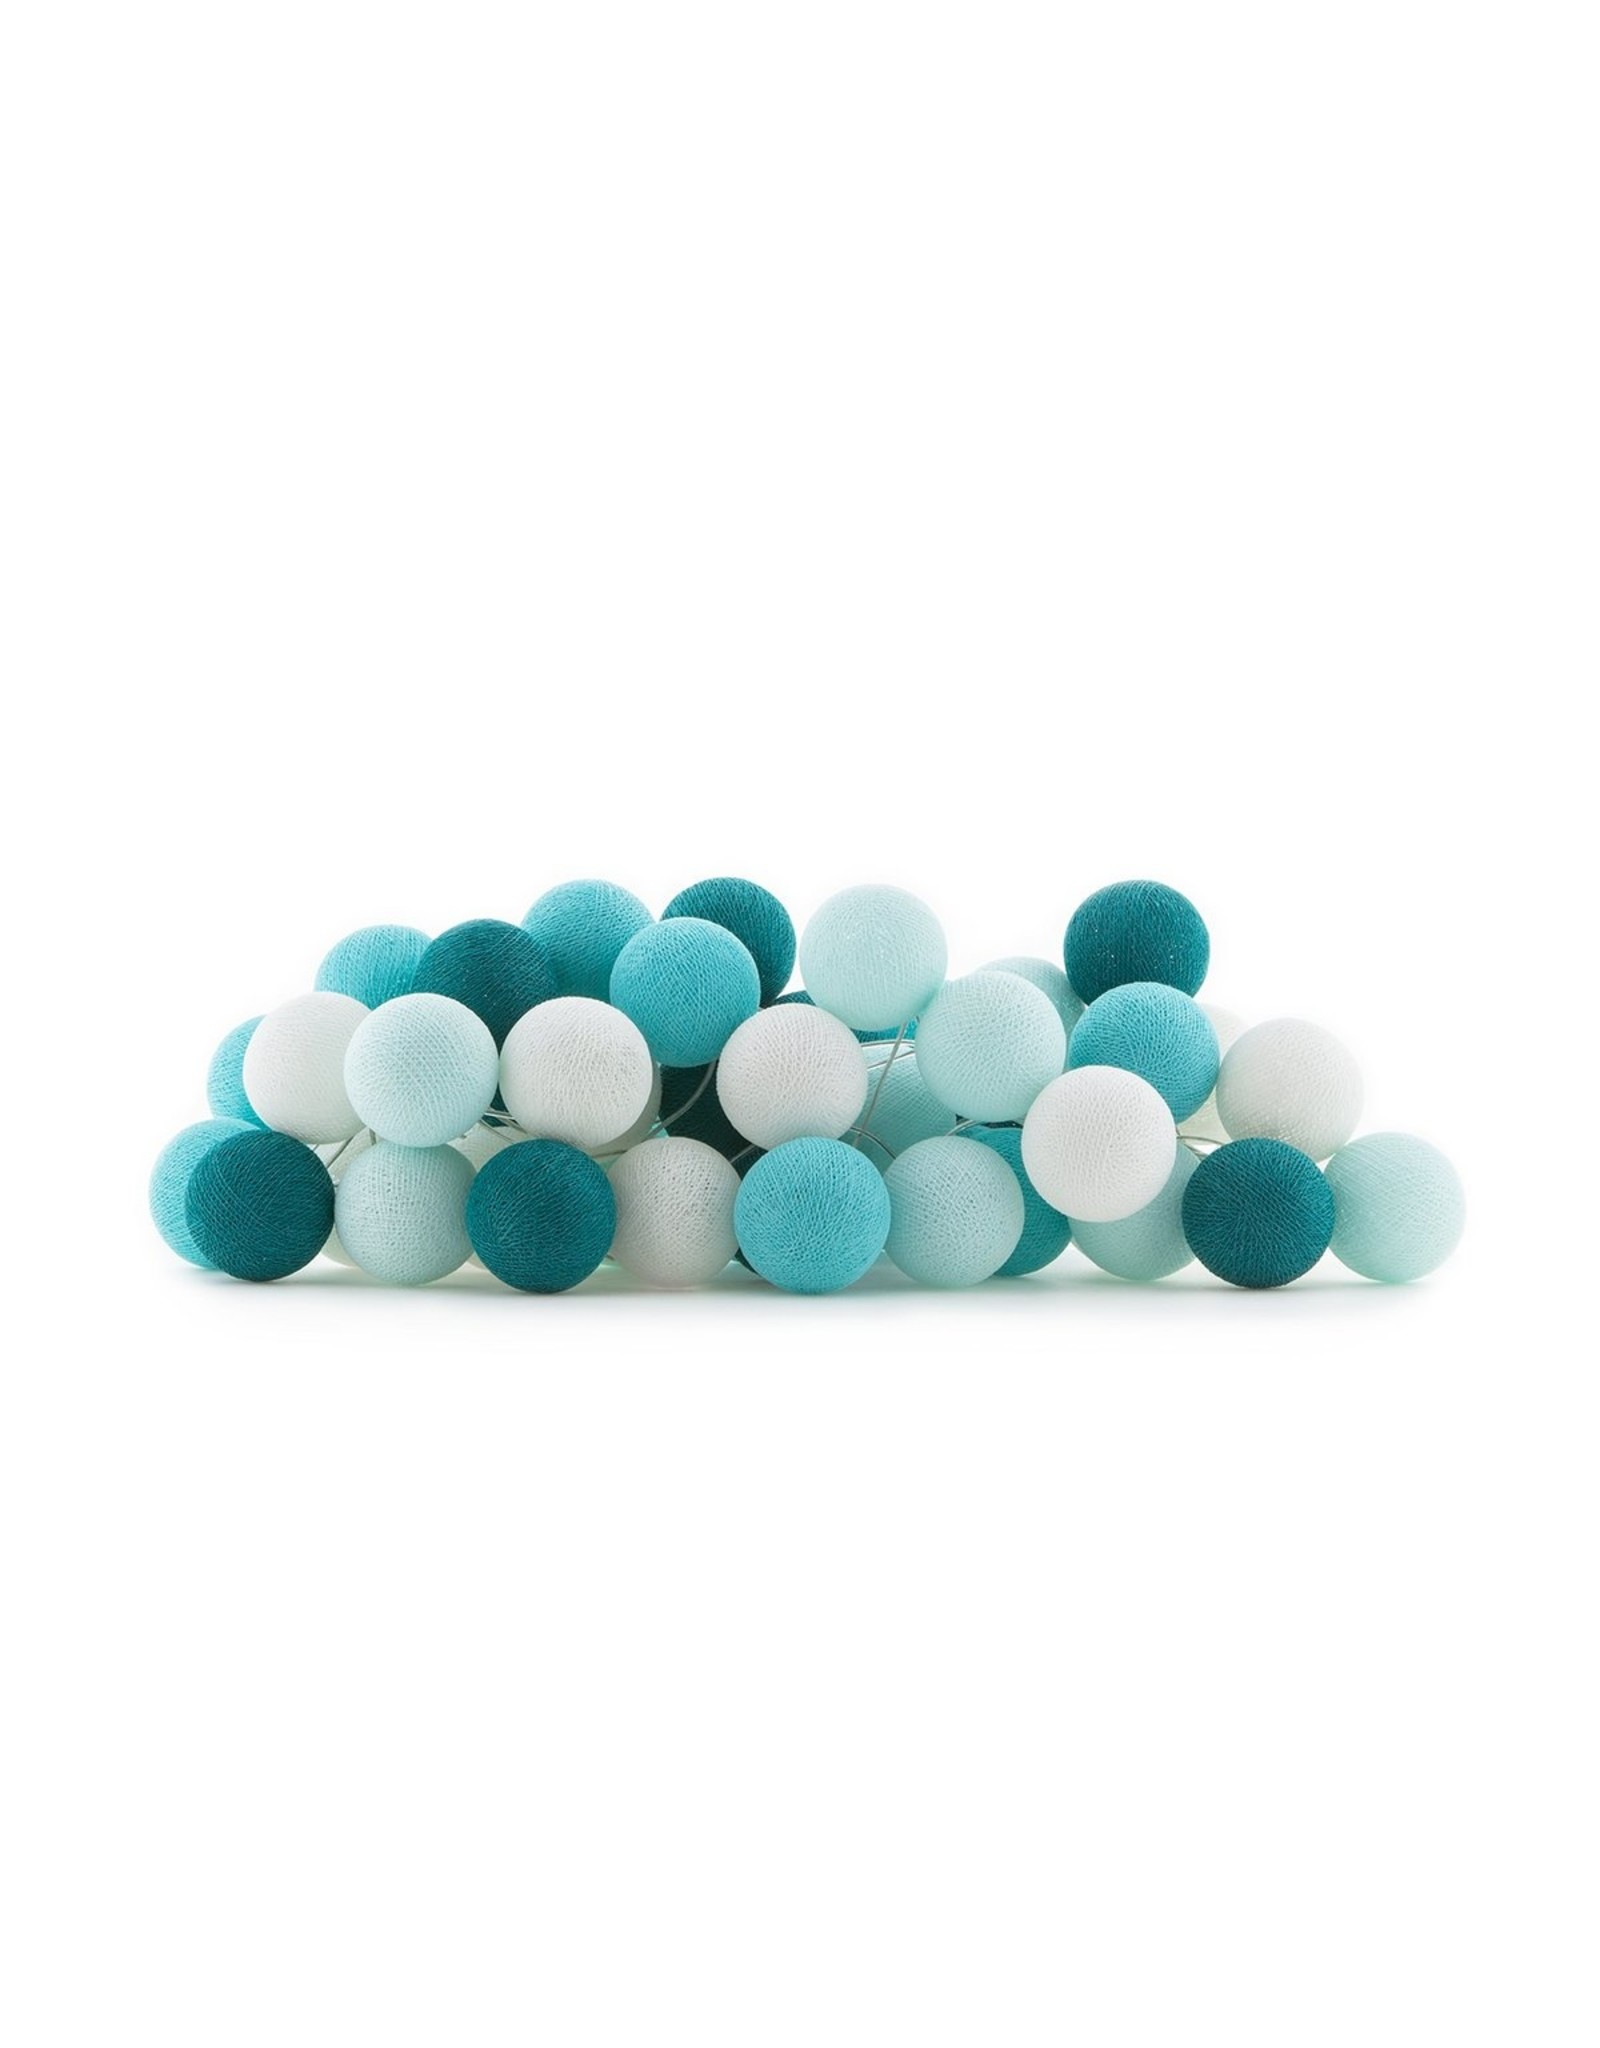 Cotton Ball Lichtslinger: Aqua